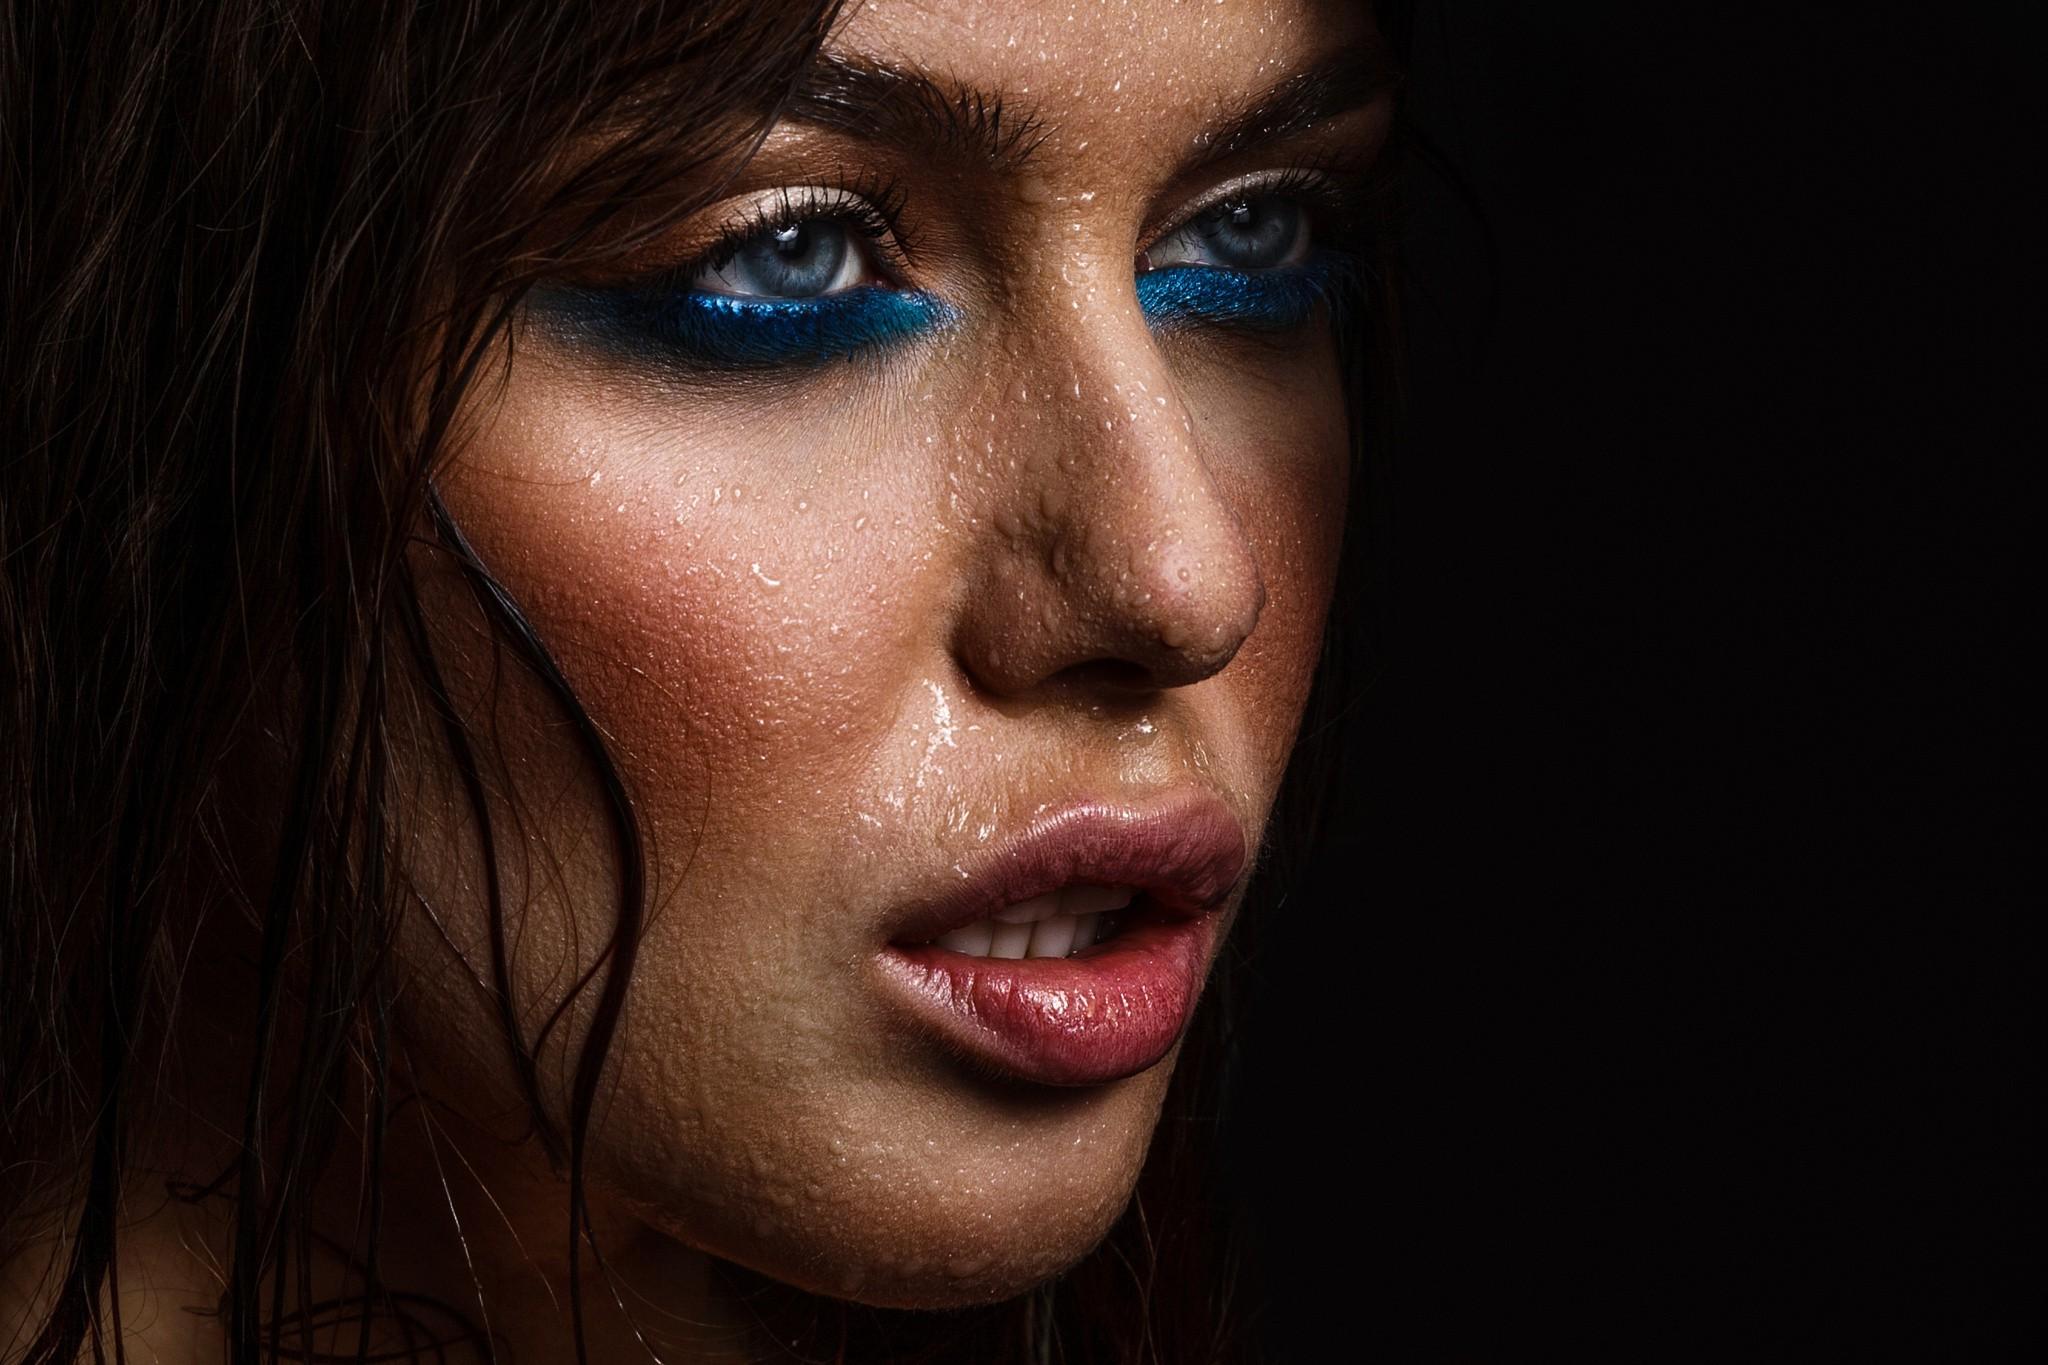 Wallpaper 2048x1365 Px Black Background Blue Eyes Closeup Face